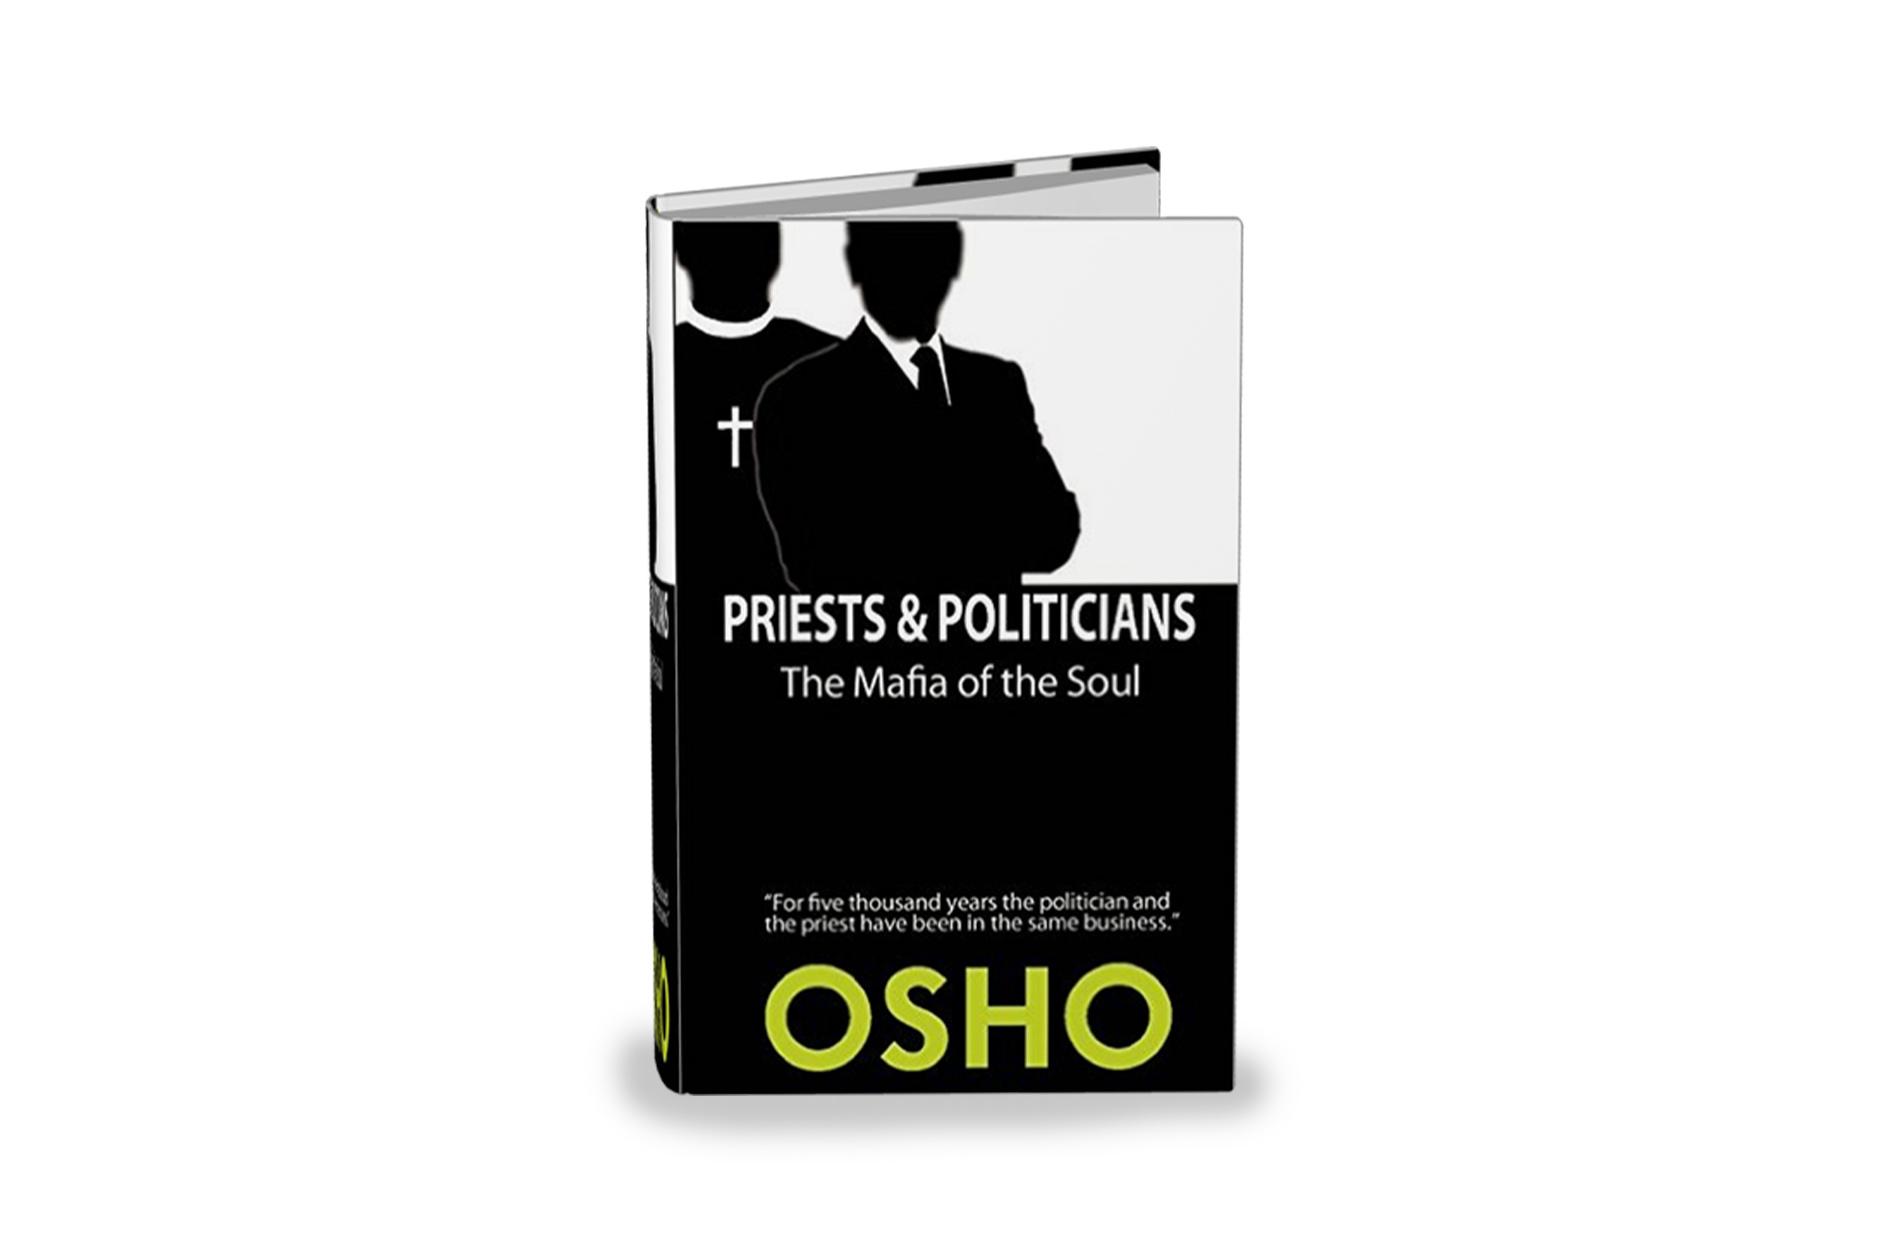 Priests & Politicians: The Mafia of the Soul